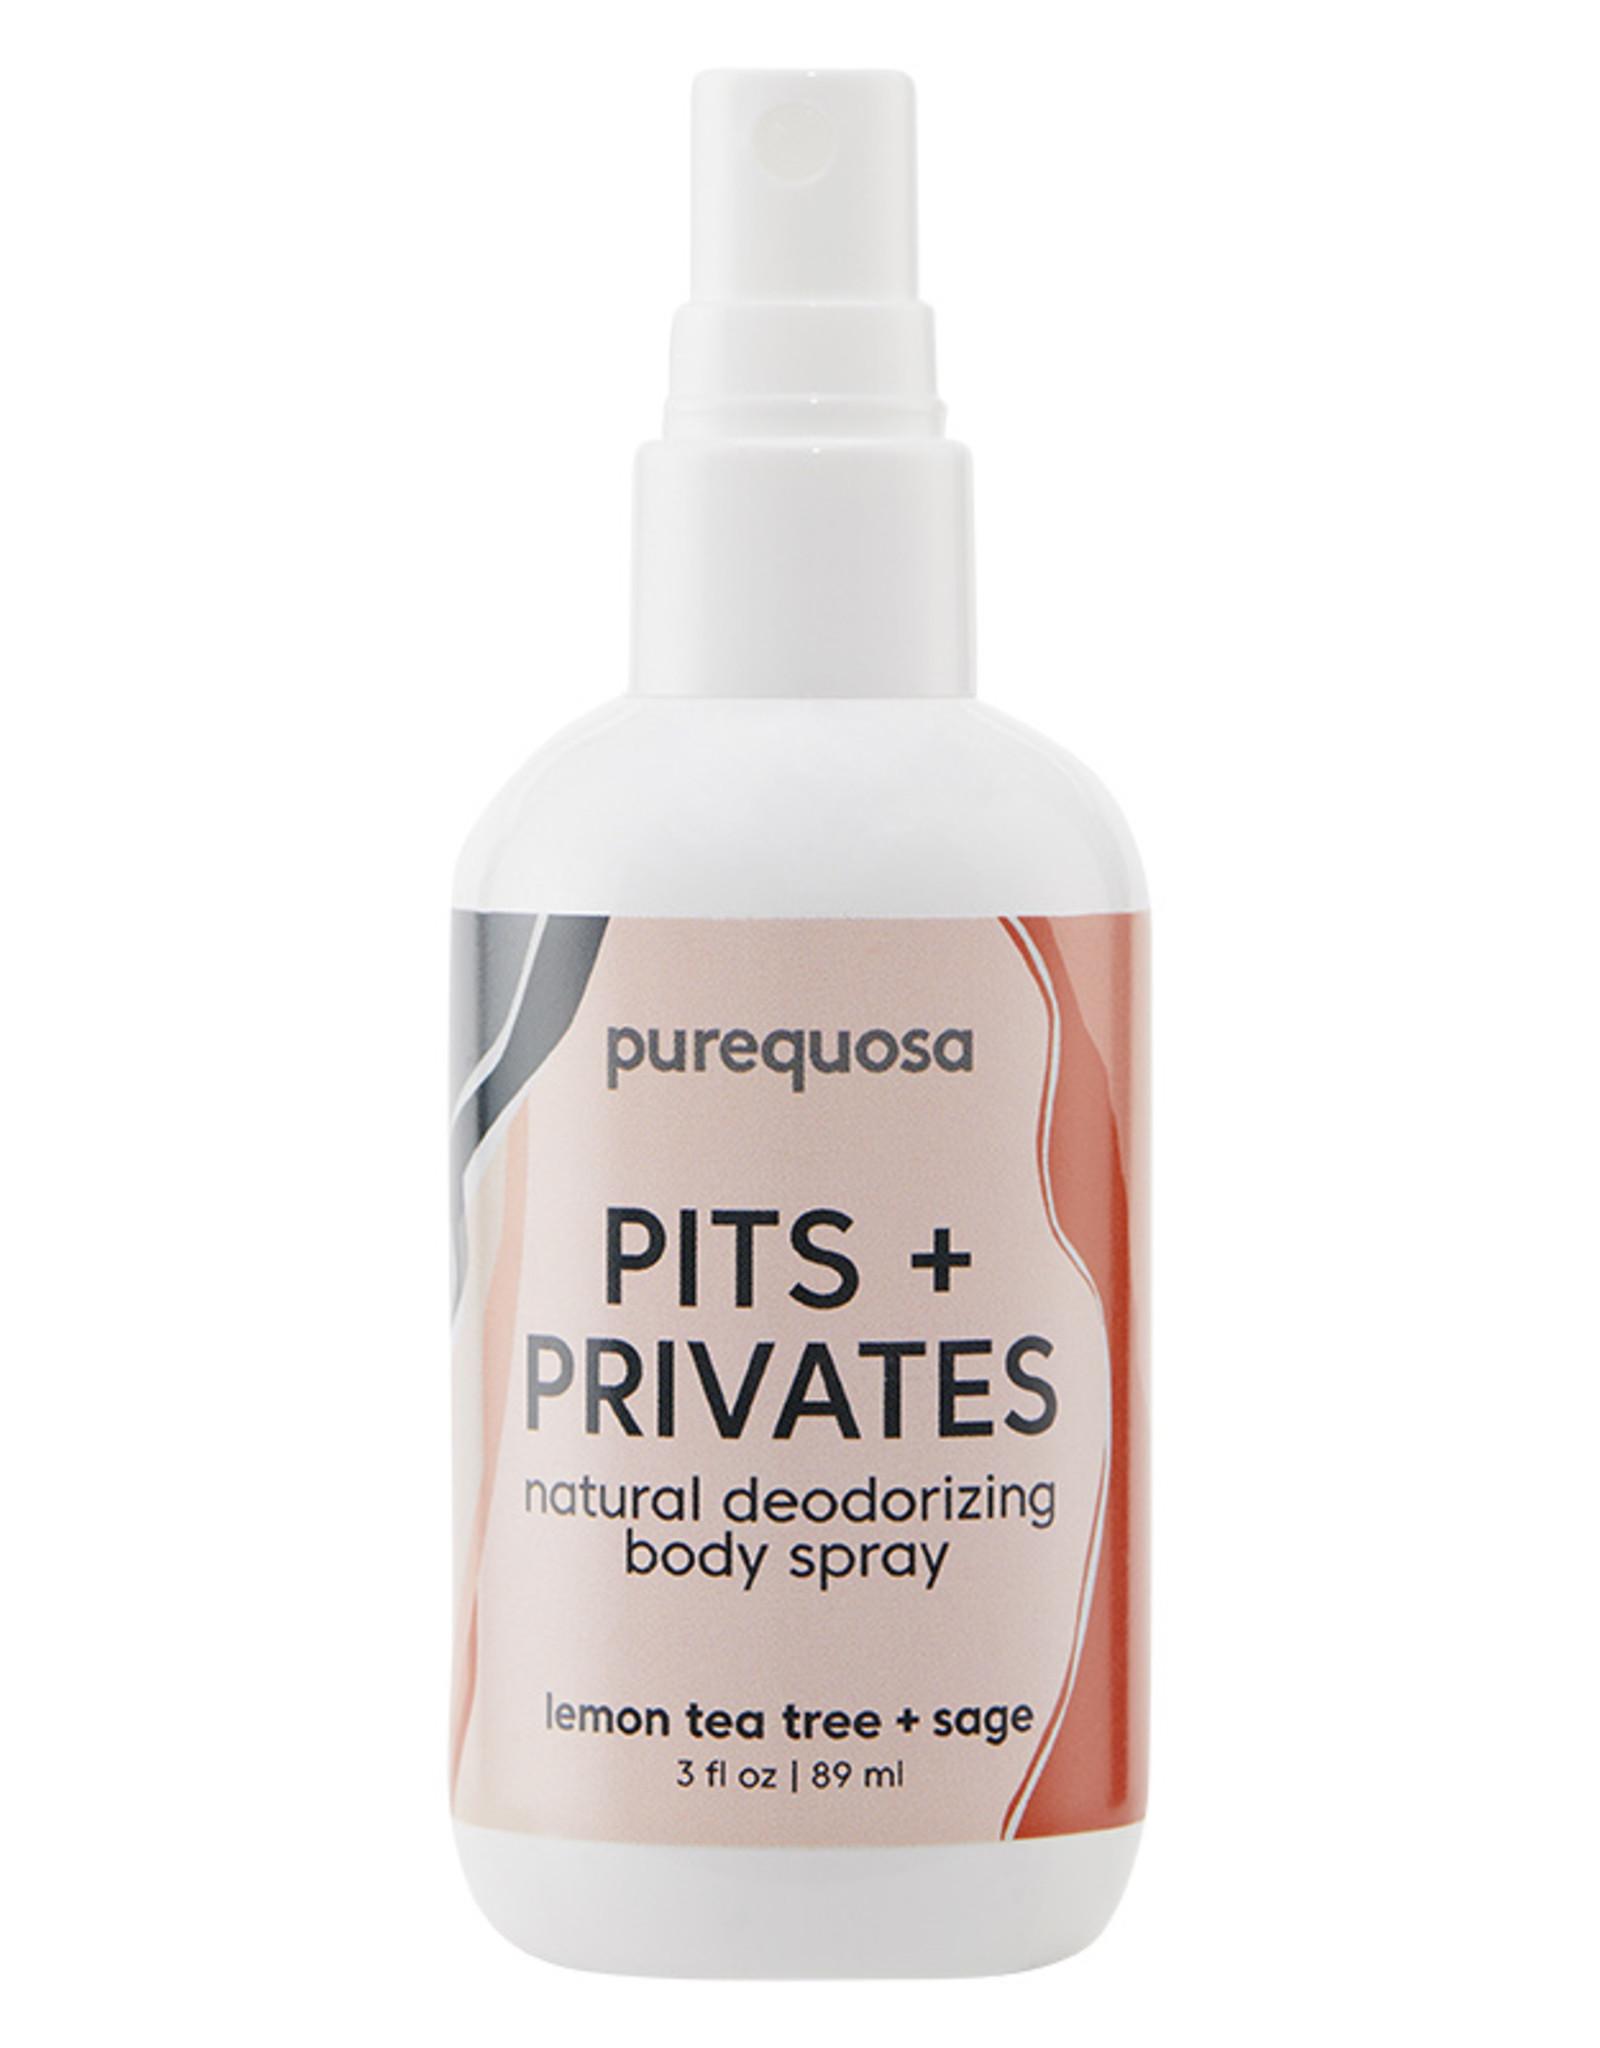 Purequosa Pits & Privates Natural Deodorizing Spray - 3oz